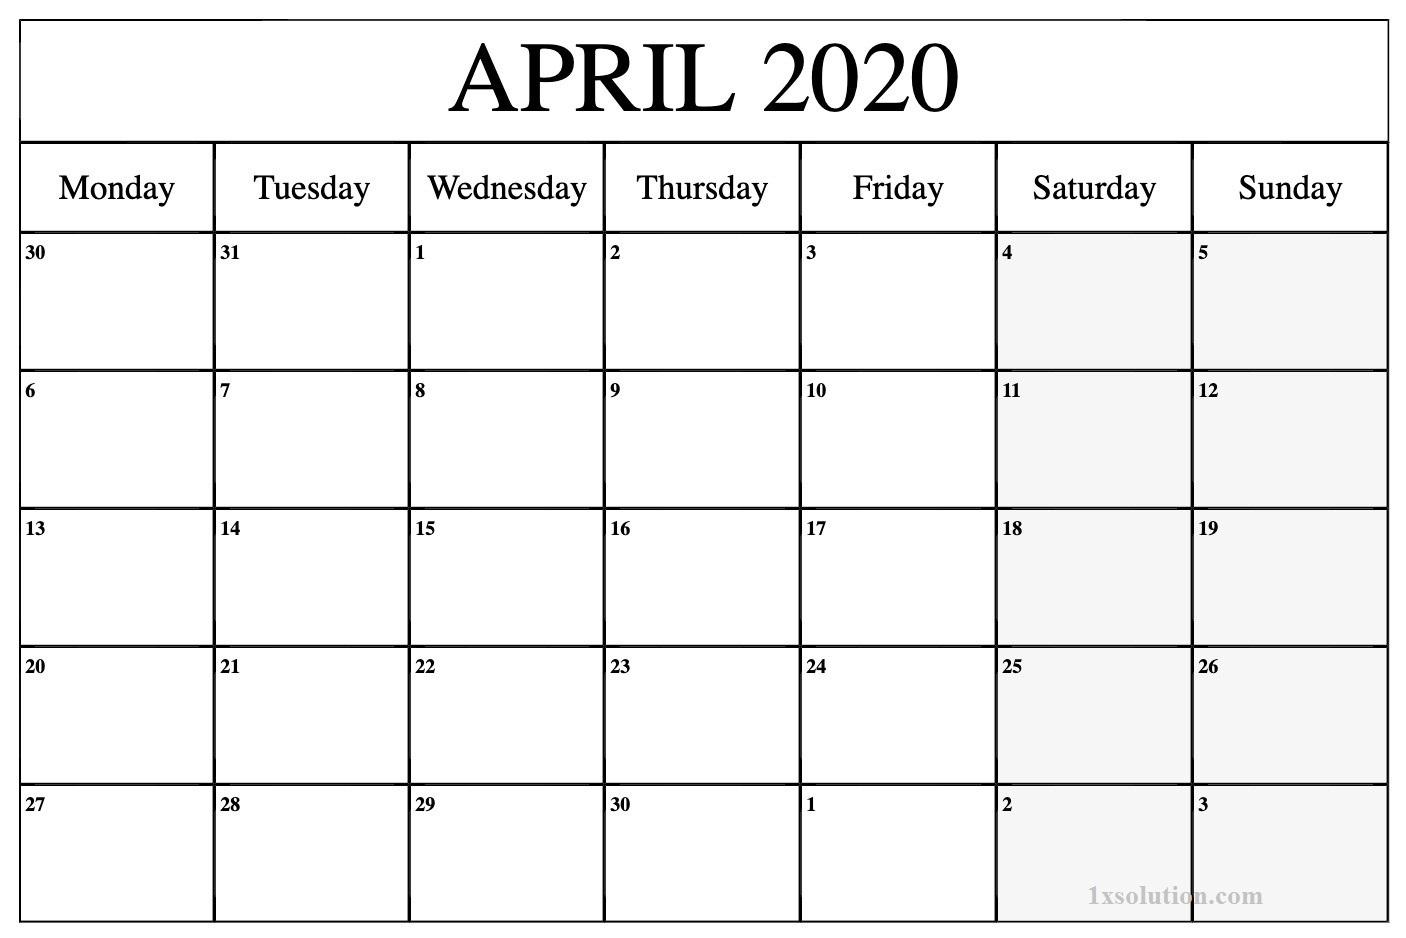 April 2020 Calendar Excel Sheet For Business Grow | Calendar